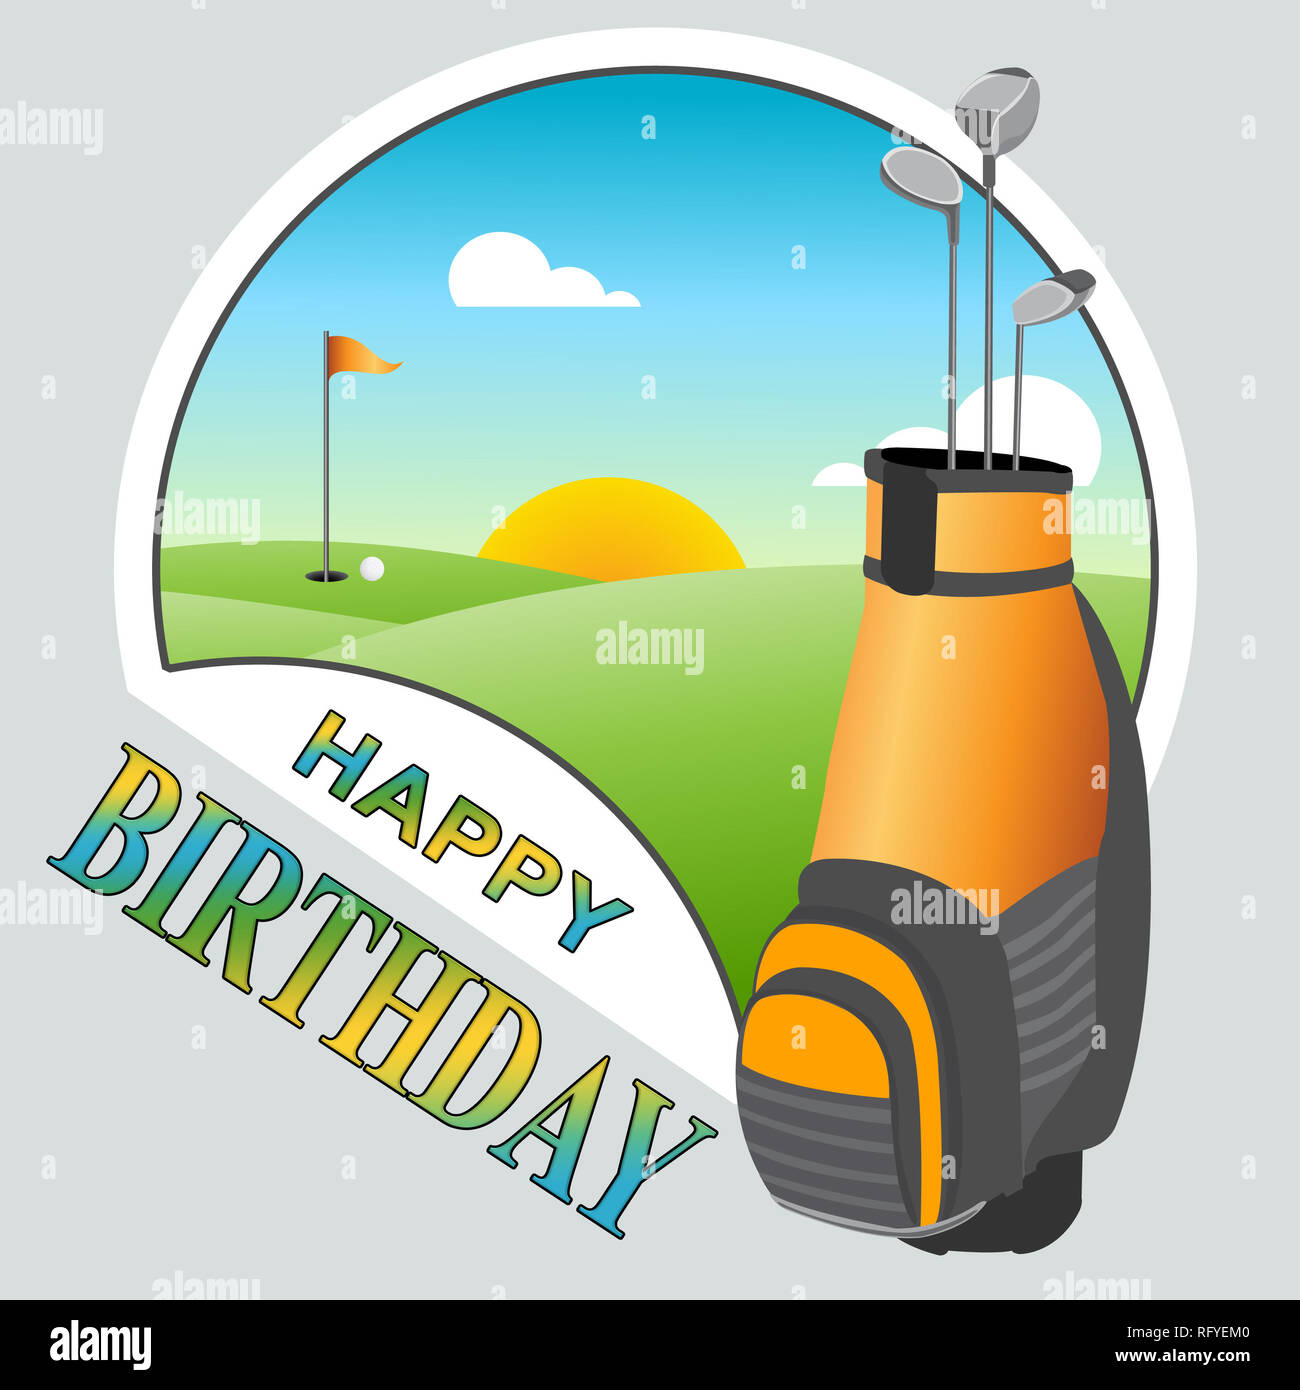 Happy Birthday Golf Nachricht Als Uberraschung Gruss Fur Golfspieler Congrats Golffanatiker